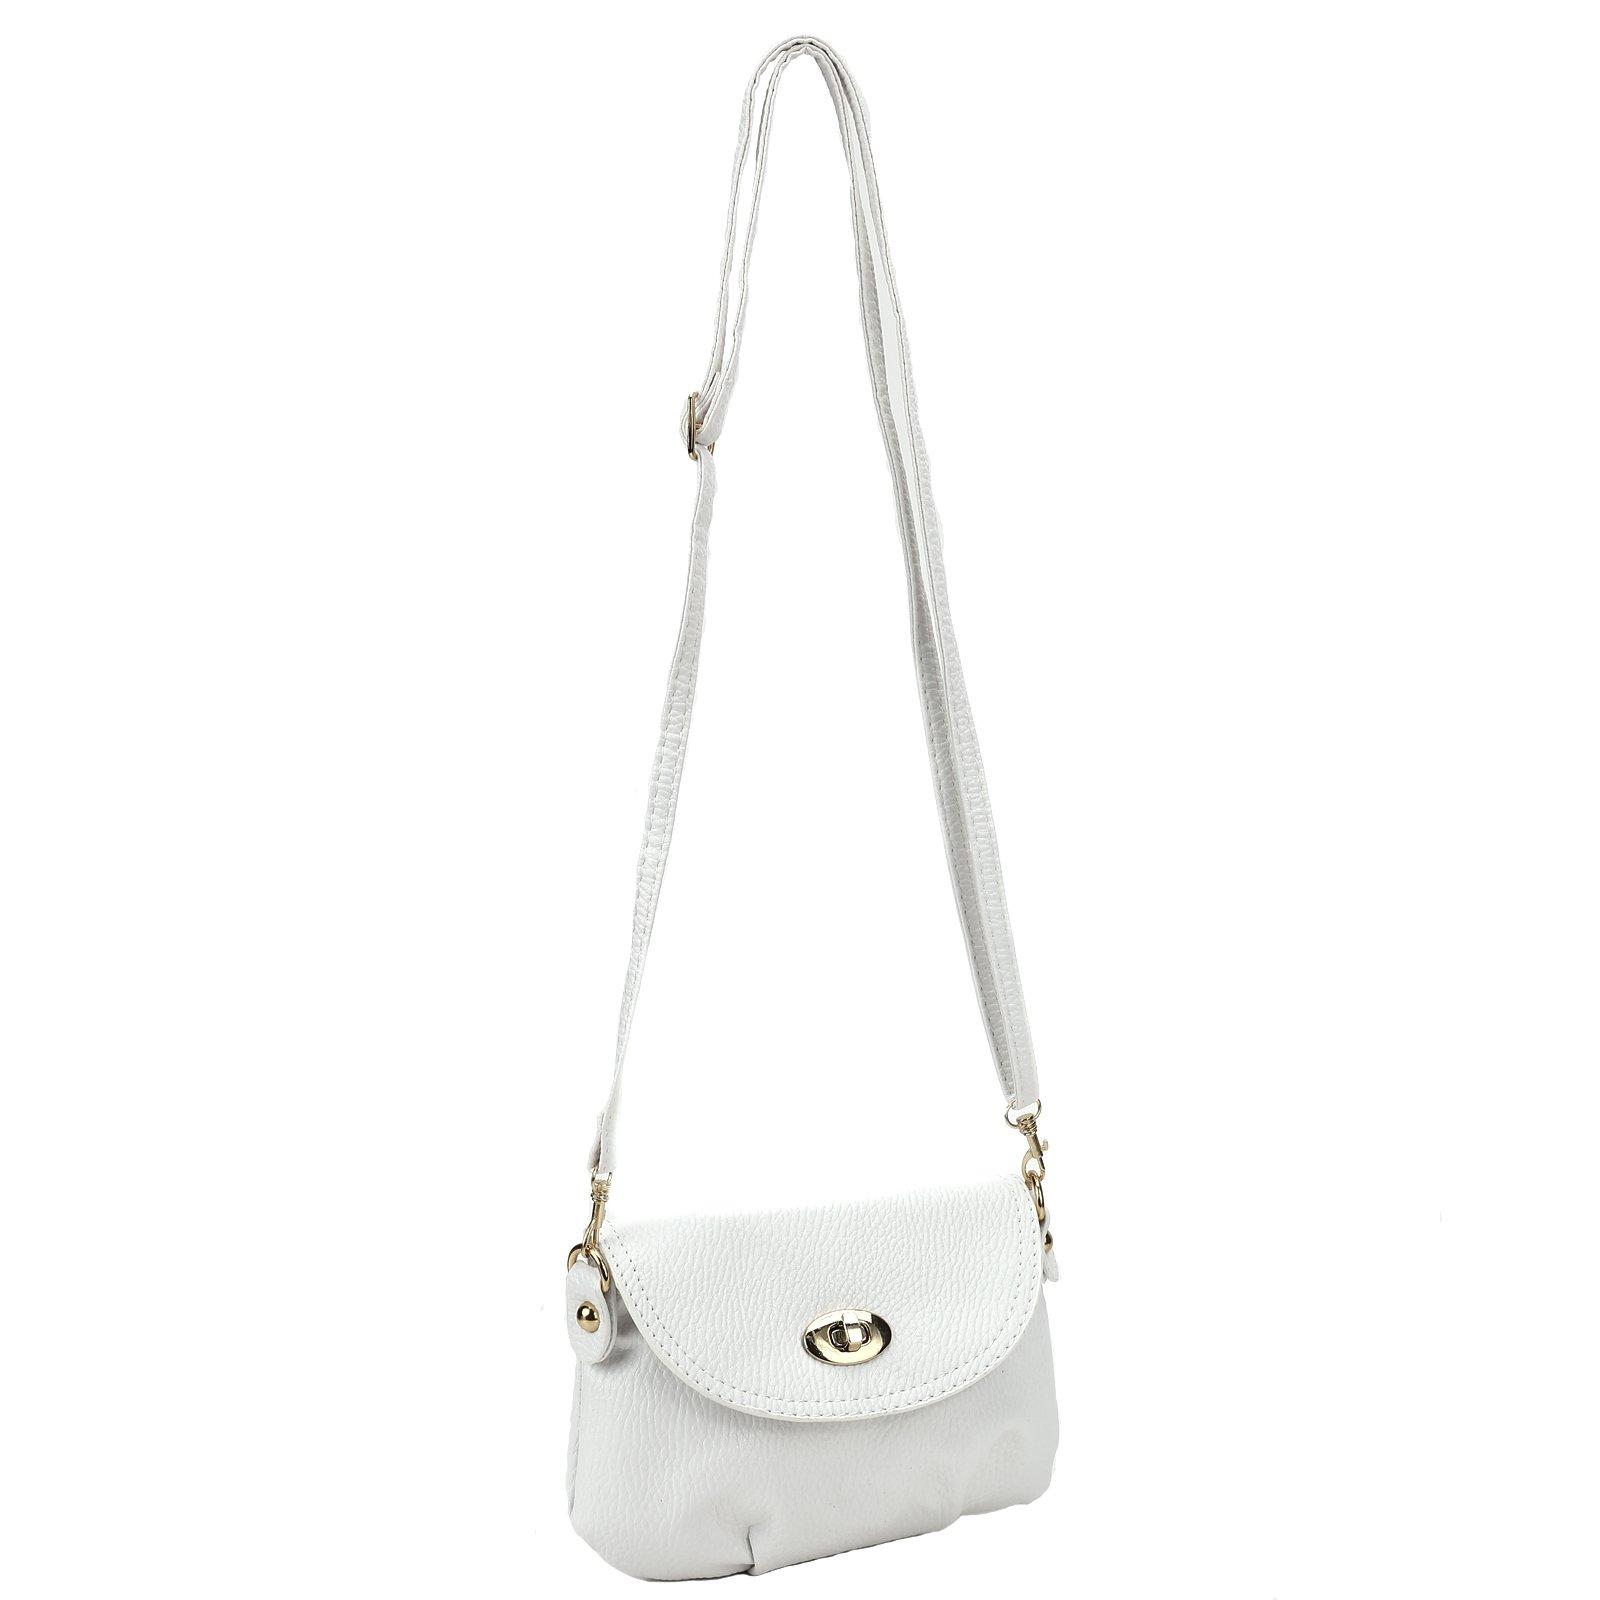 Ladies Mini SMALL Handbag Envelope Crossbody Shoulder Messenger Totes Bag Purse by Anladia (Image #2)